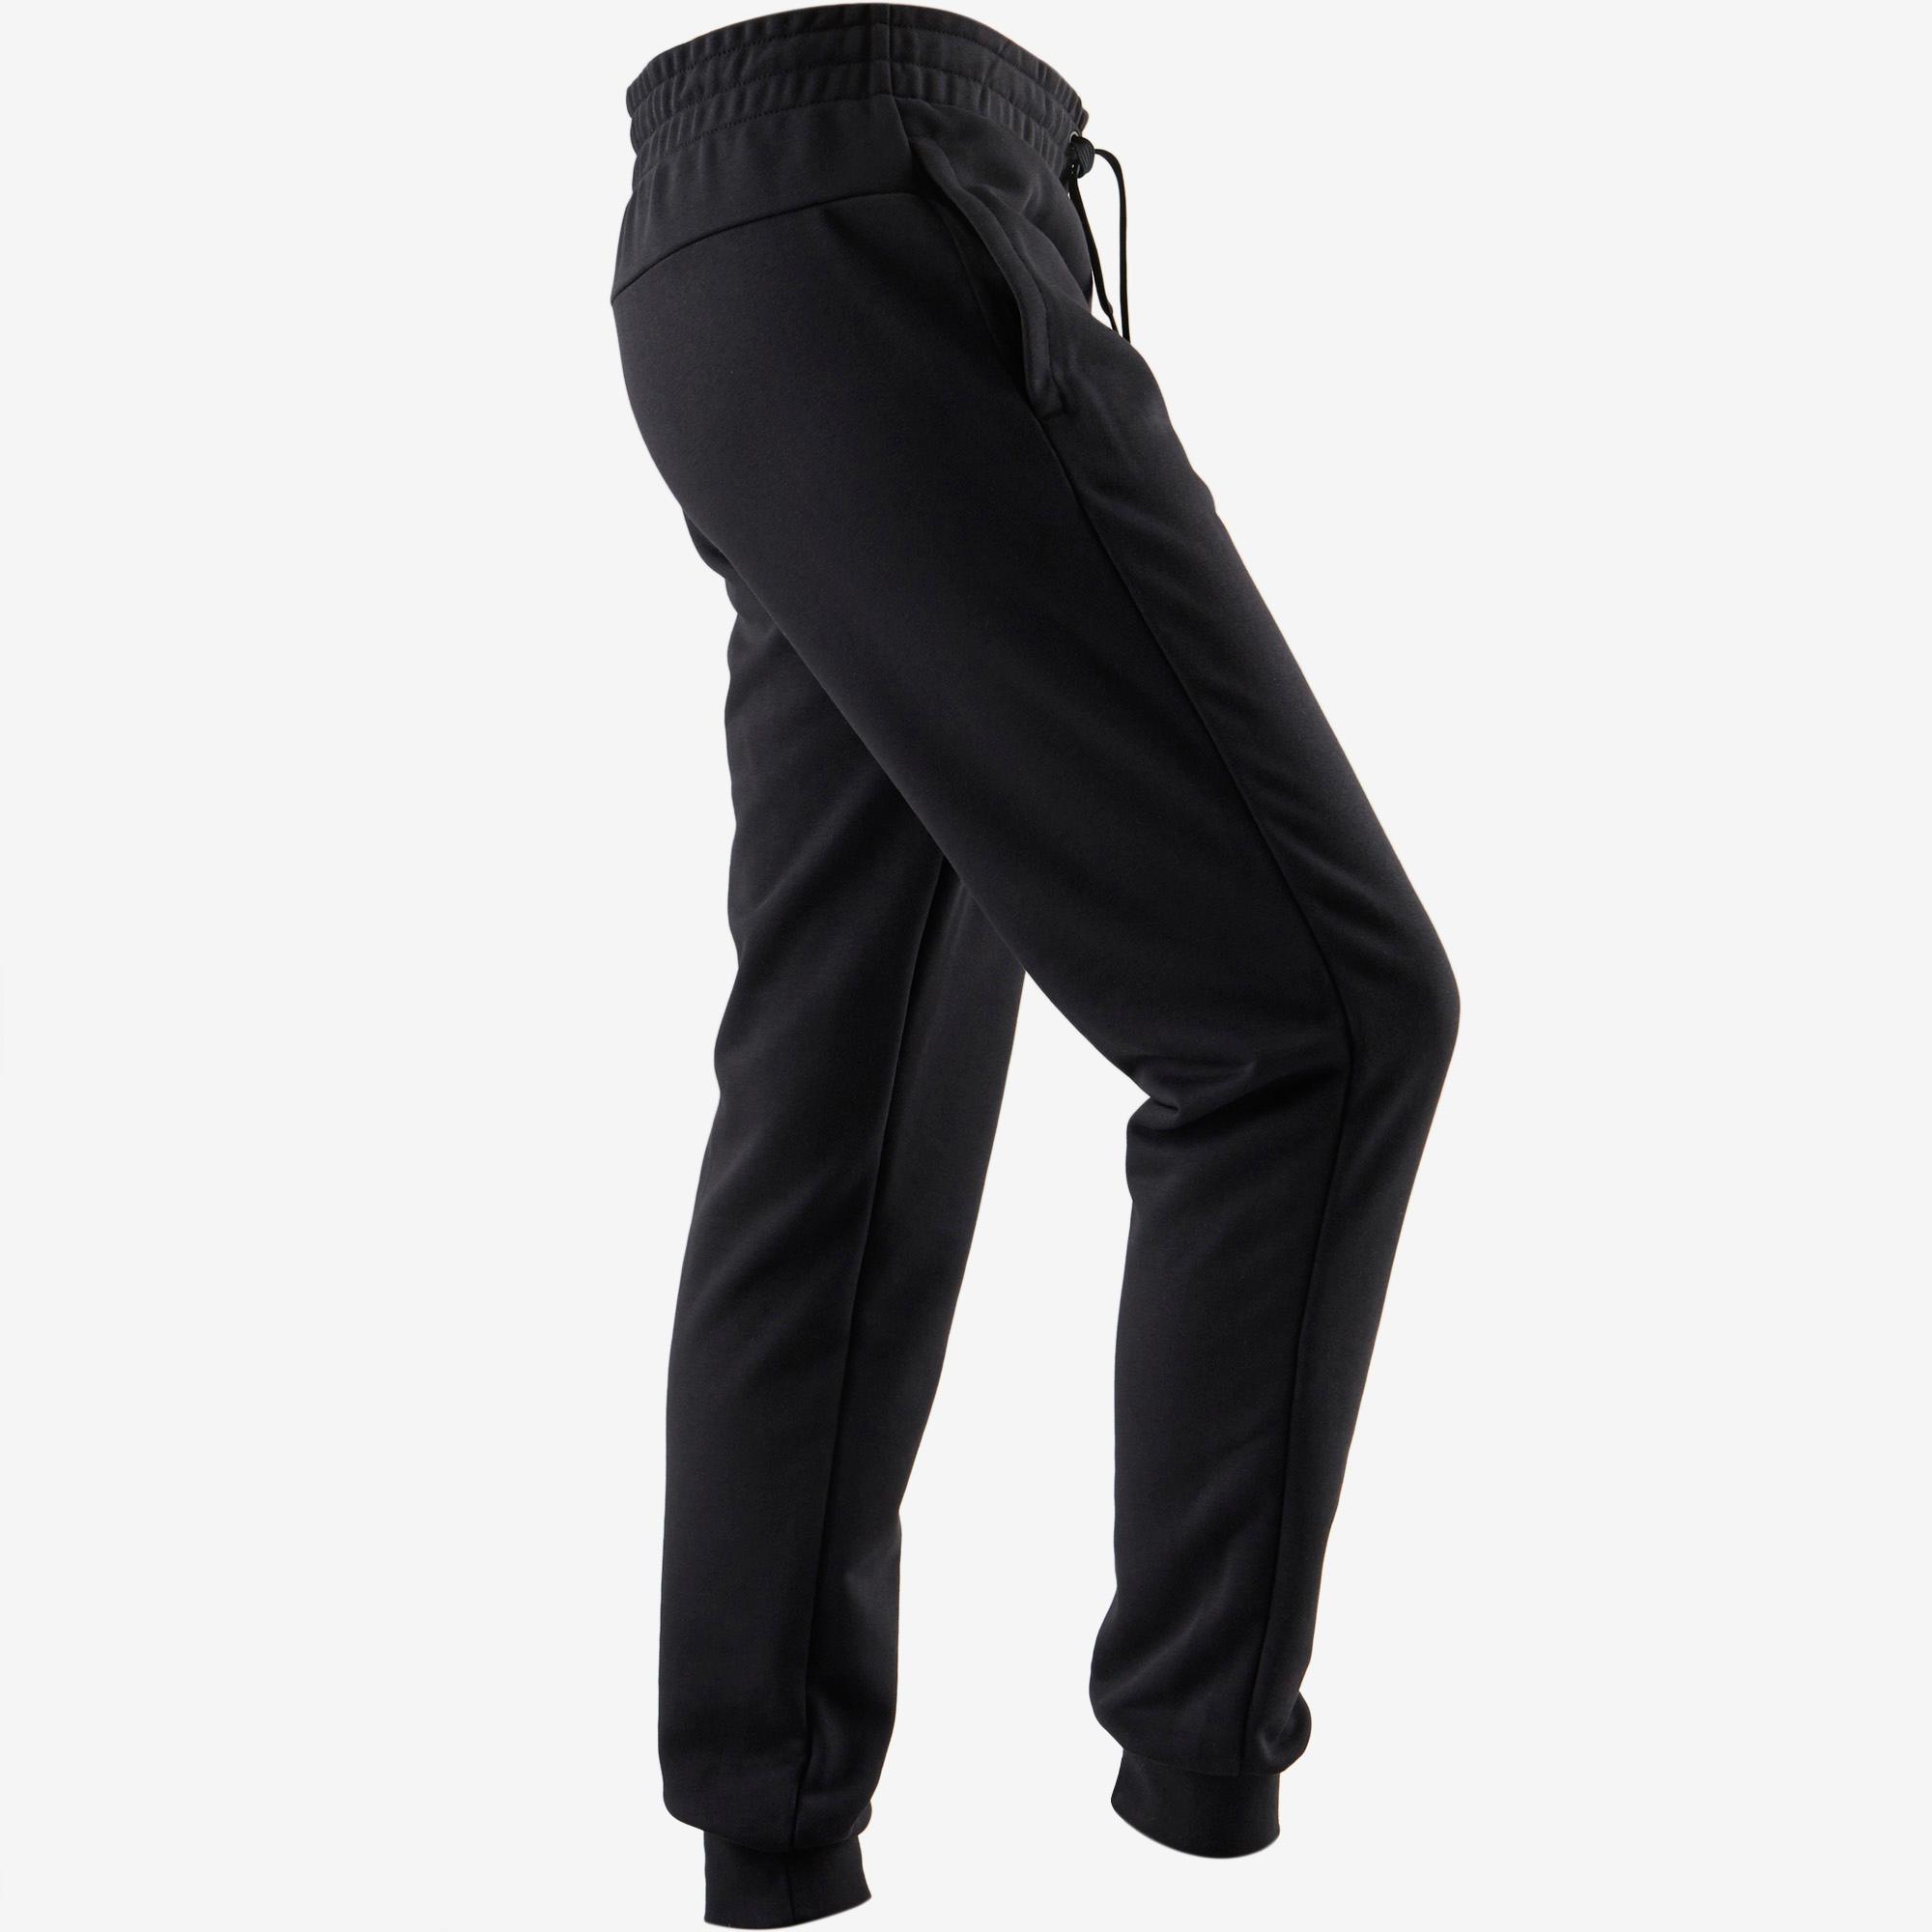 promo code e88a2 71418 Noirblanc Femme Douce Gym Pantalon 500 Linear Pilates Adidas